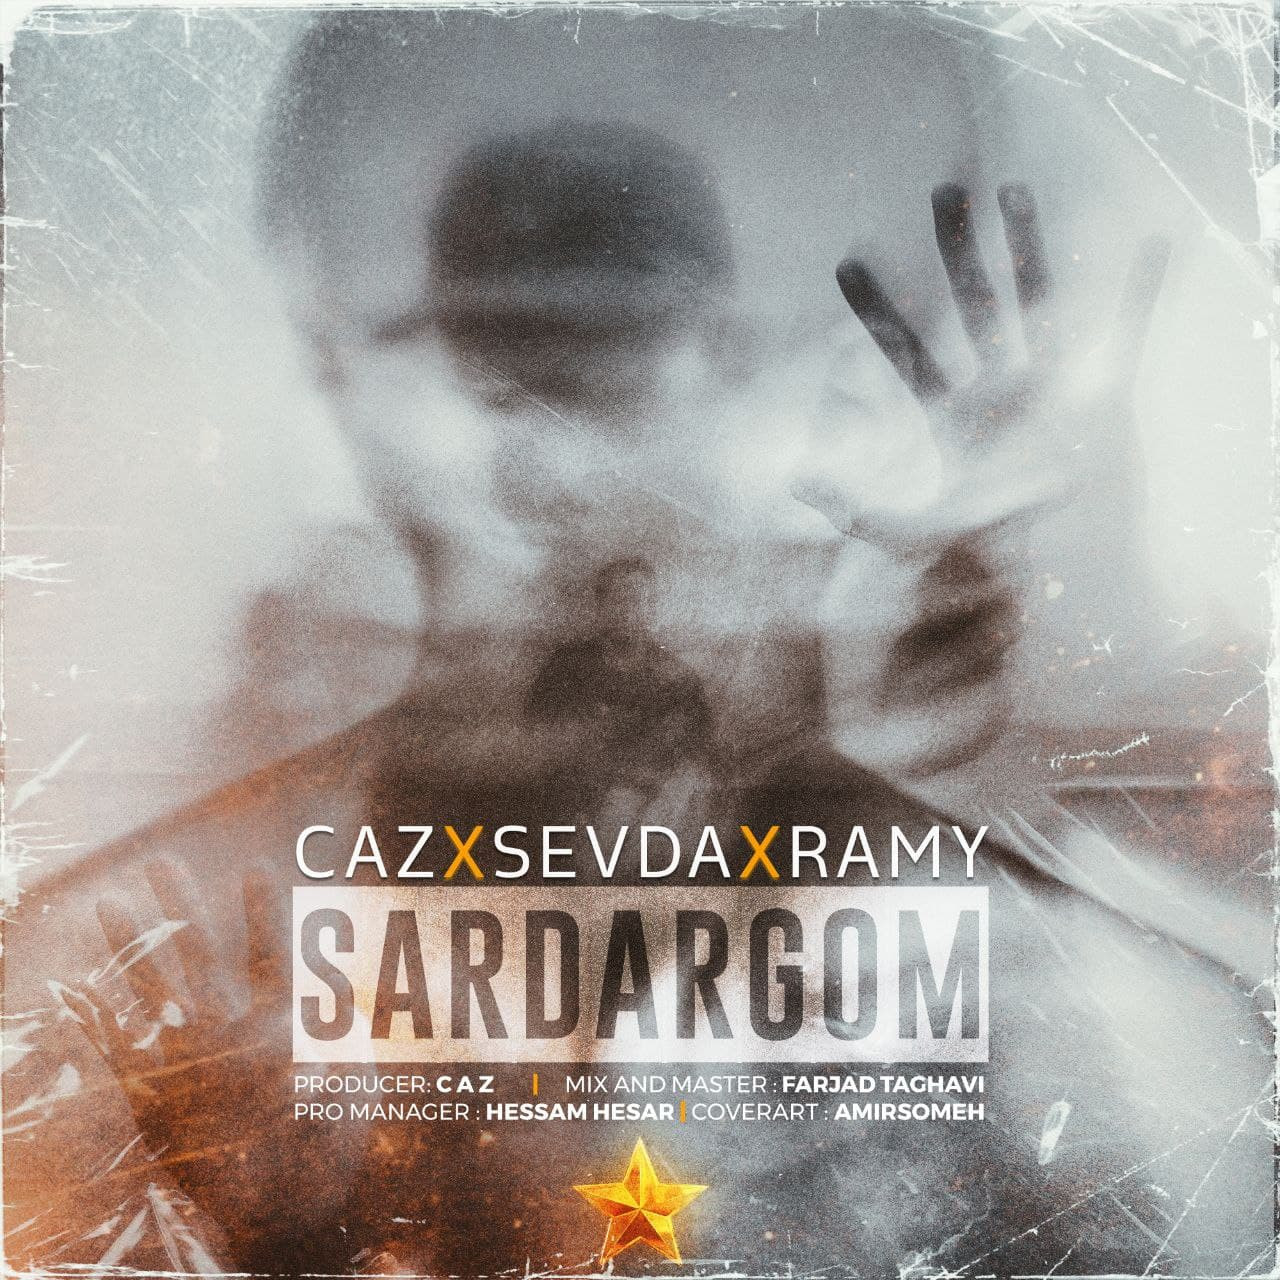 Caz & Sevda & Ramy - Sardargom